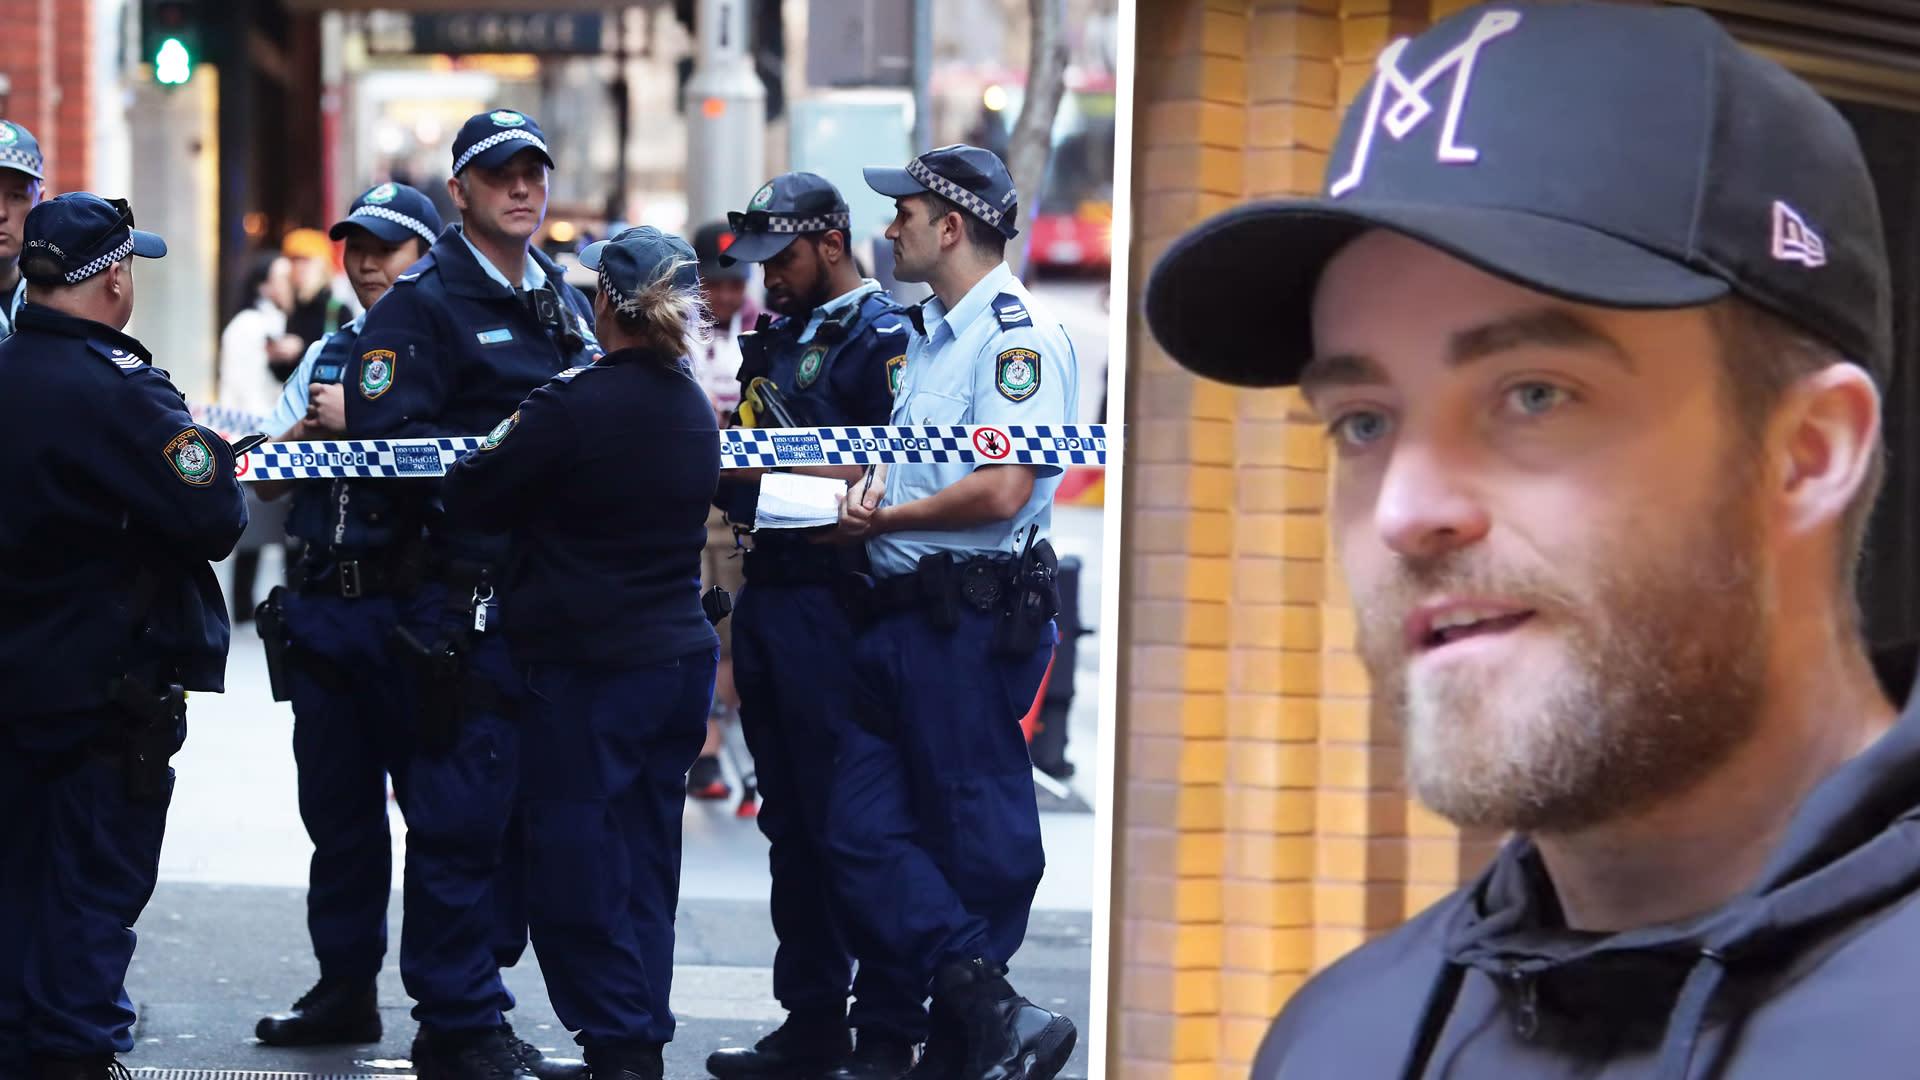 Sydney knife attack: Ex-Bury footballer becomes citizen arrest hero in Australia